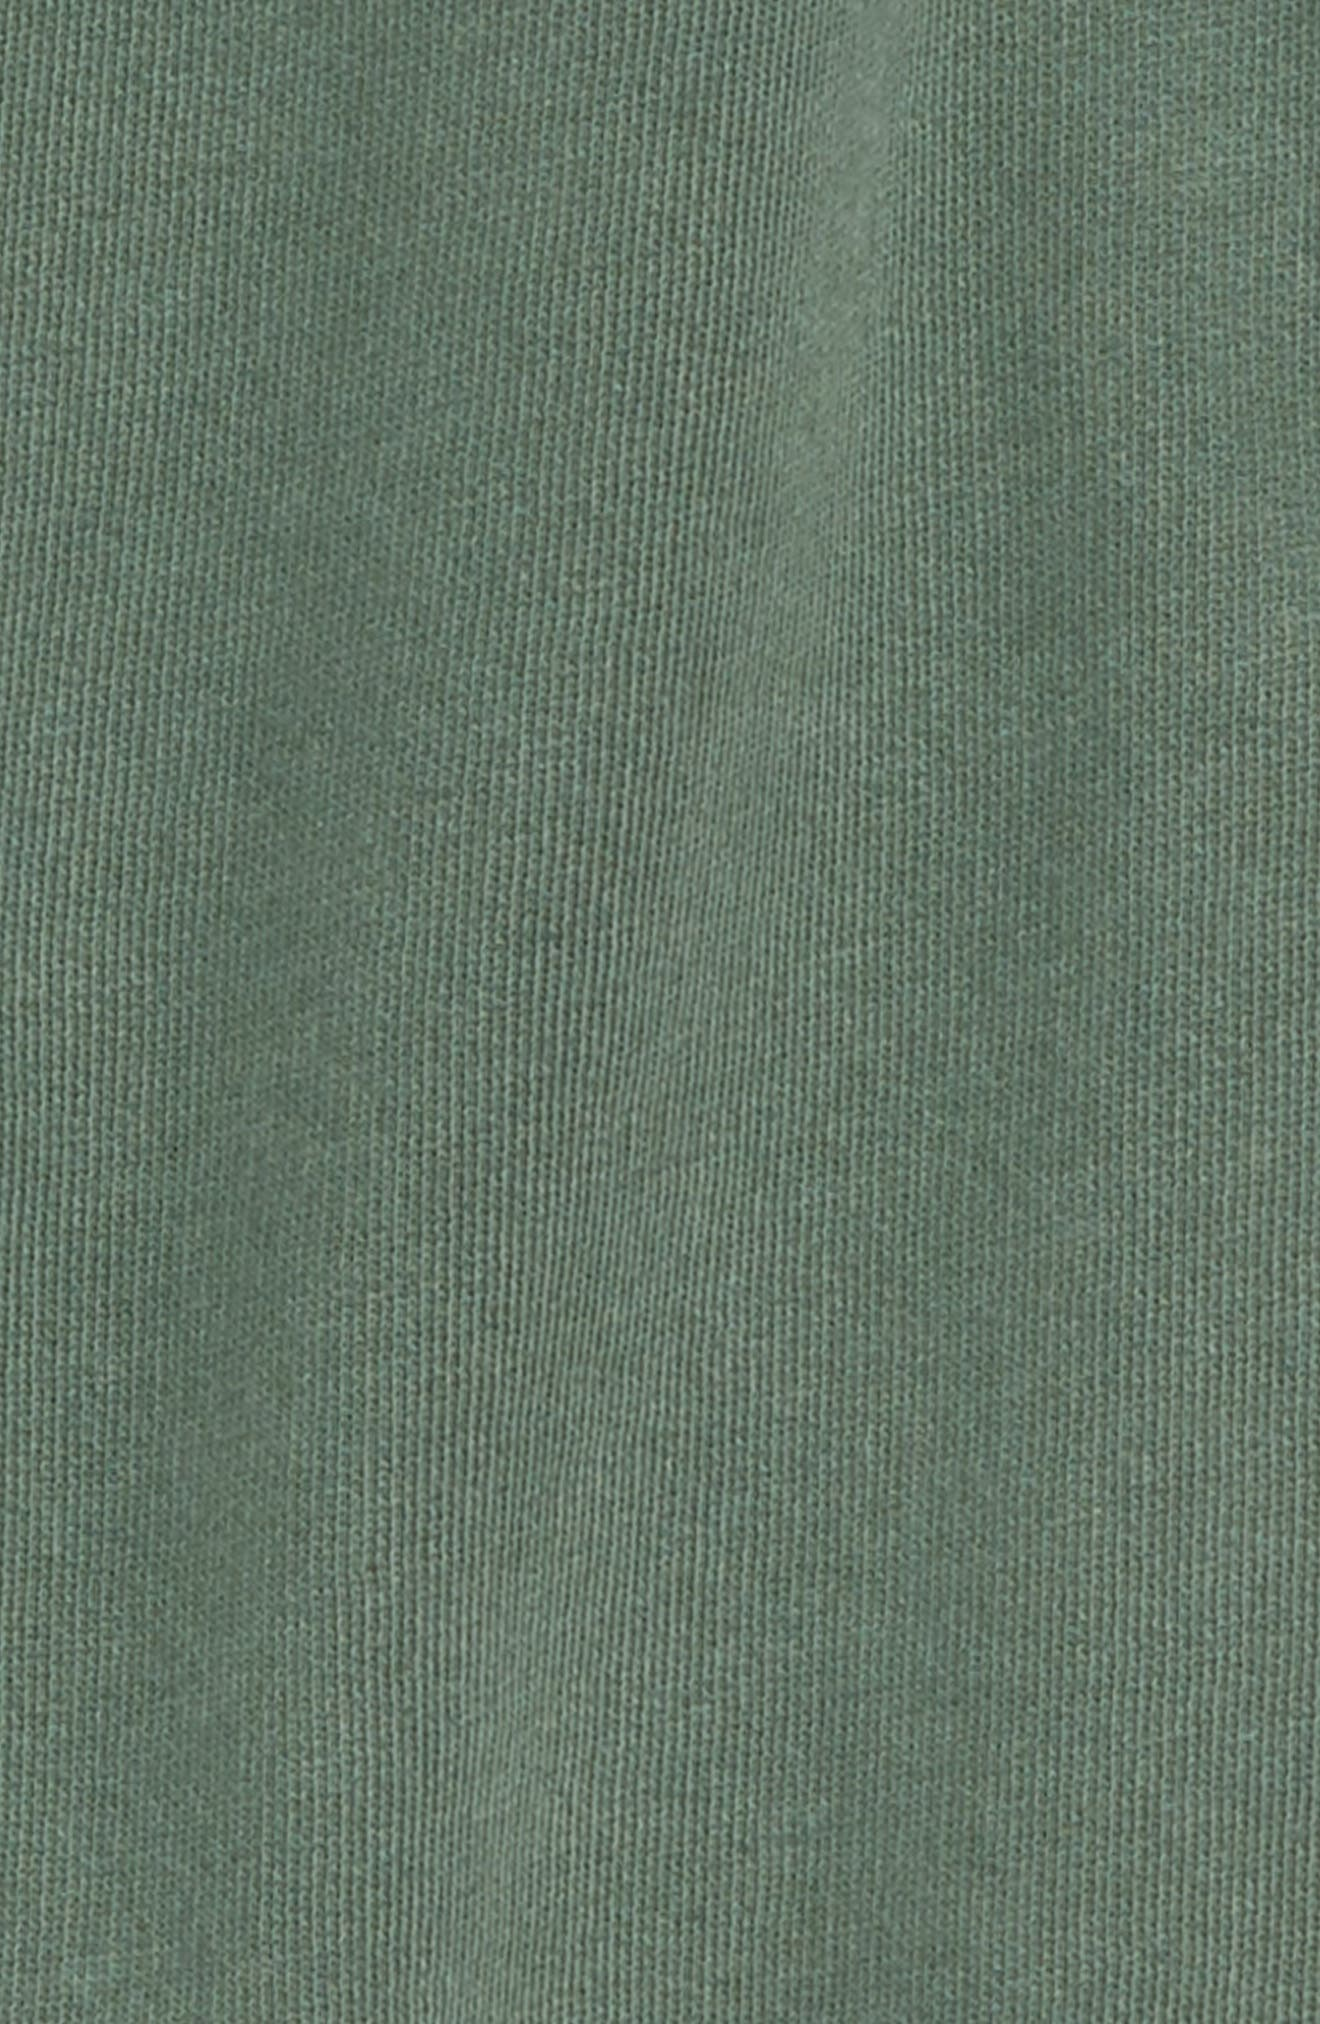 Zip Jogger Pants,                             Alternate thumbnail 2, color,                             301